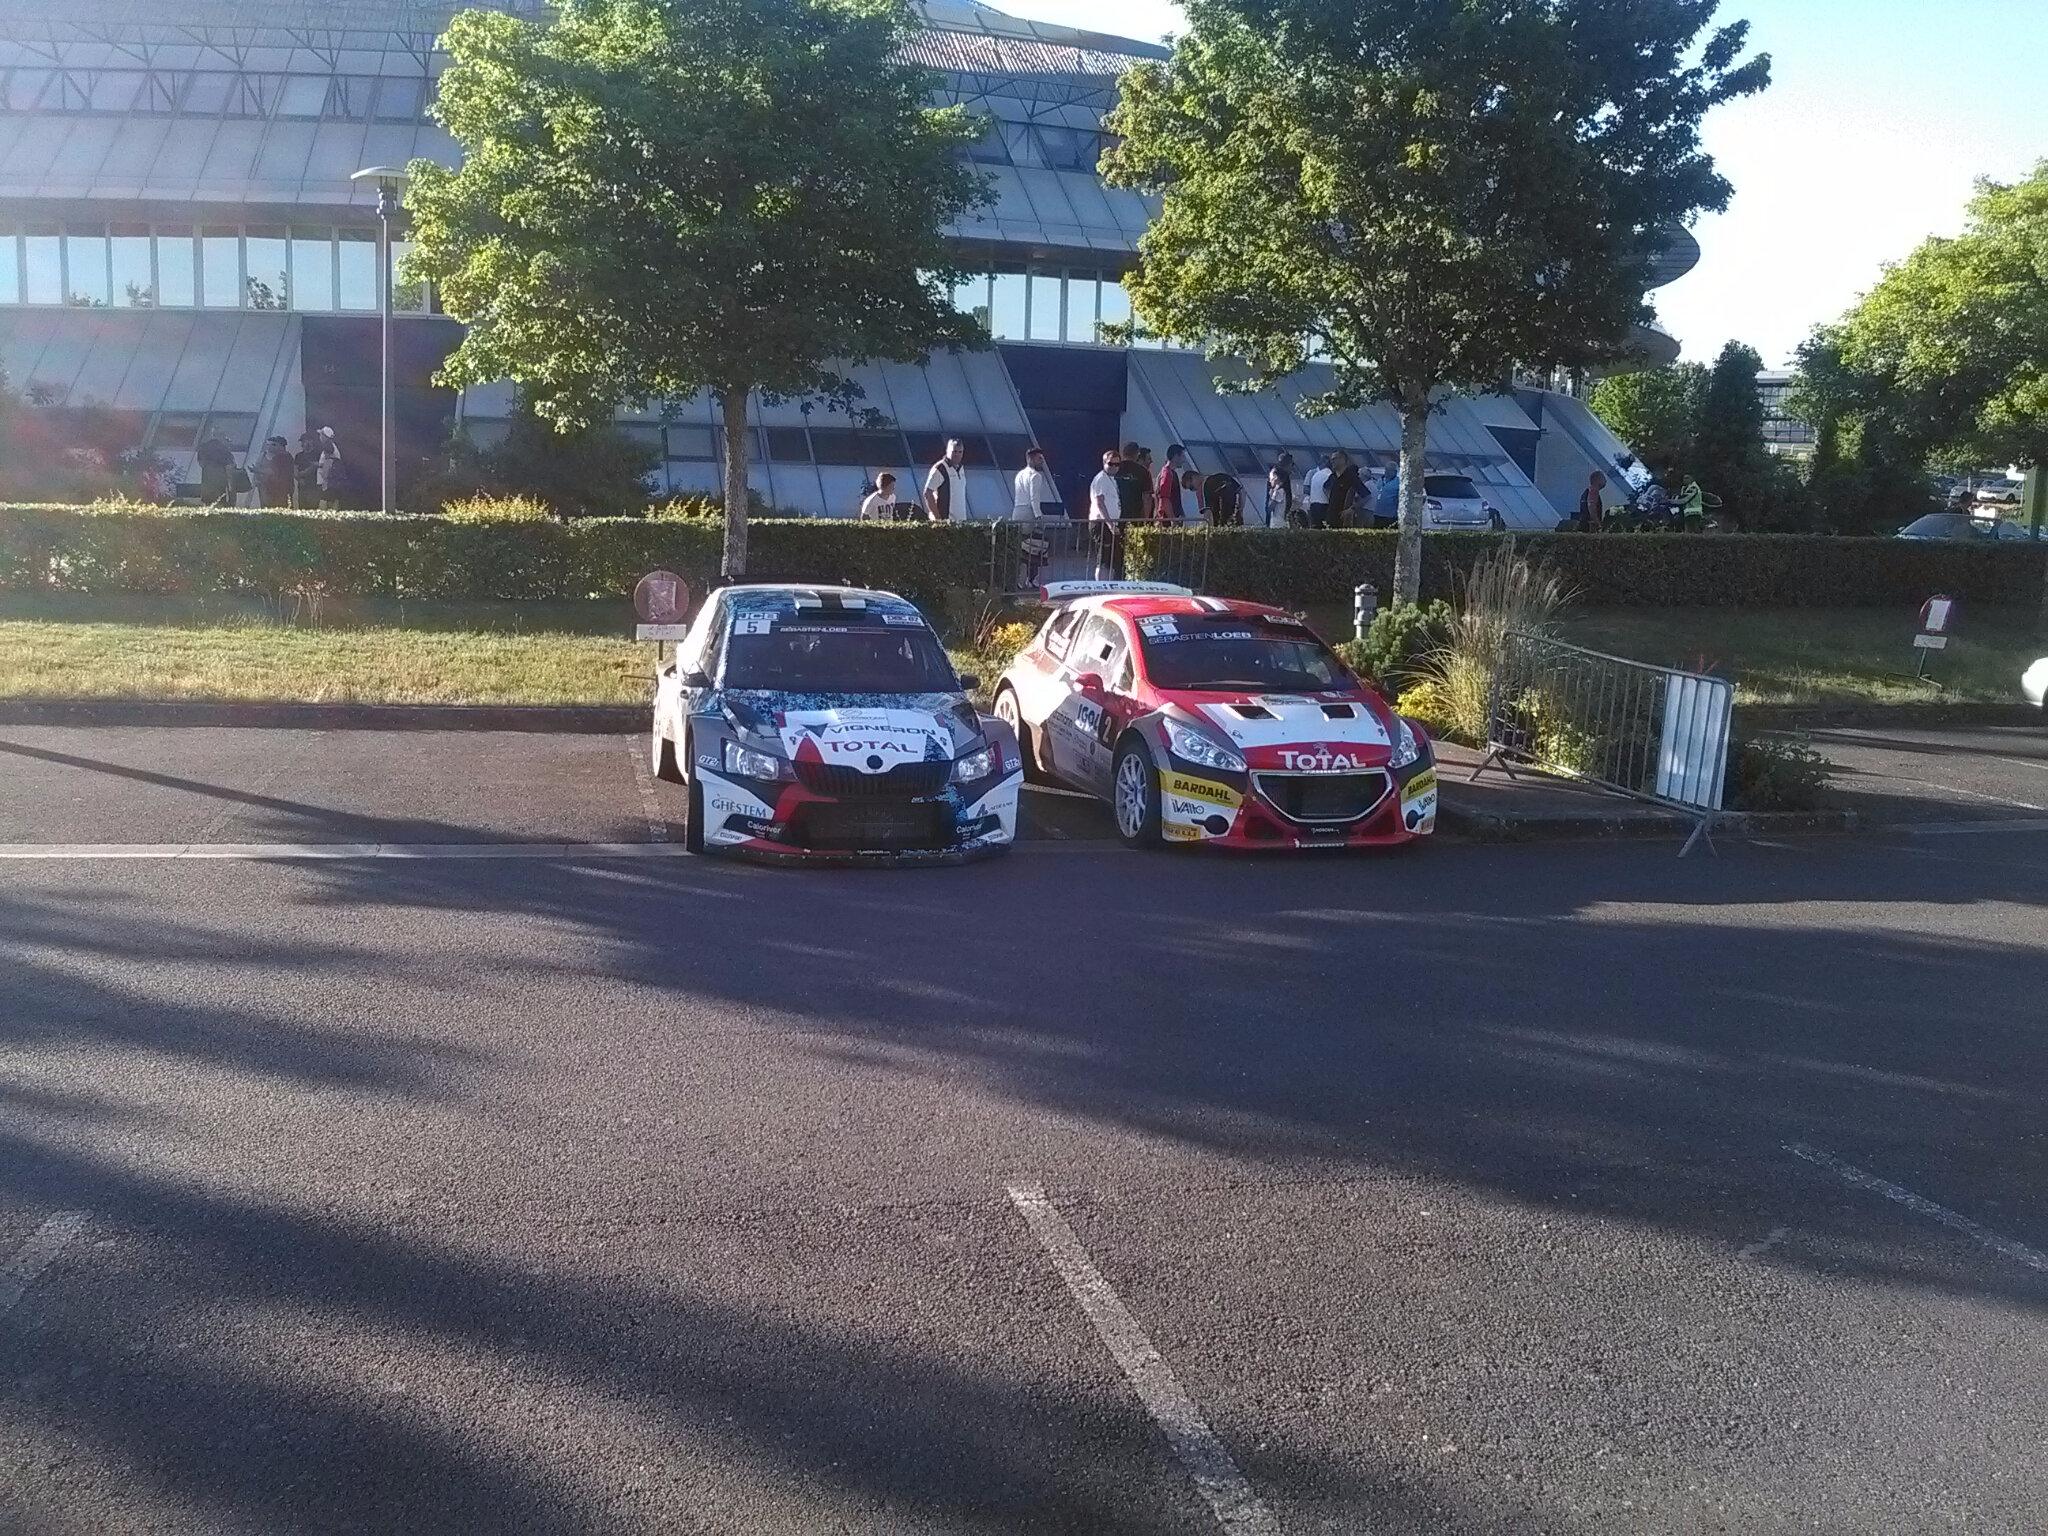 Quentin giordano Skoda fabia r5 et Charles martin Peugeot 208 t16 r5